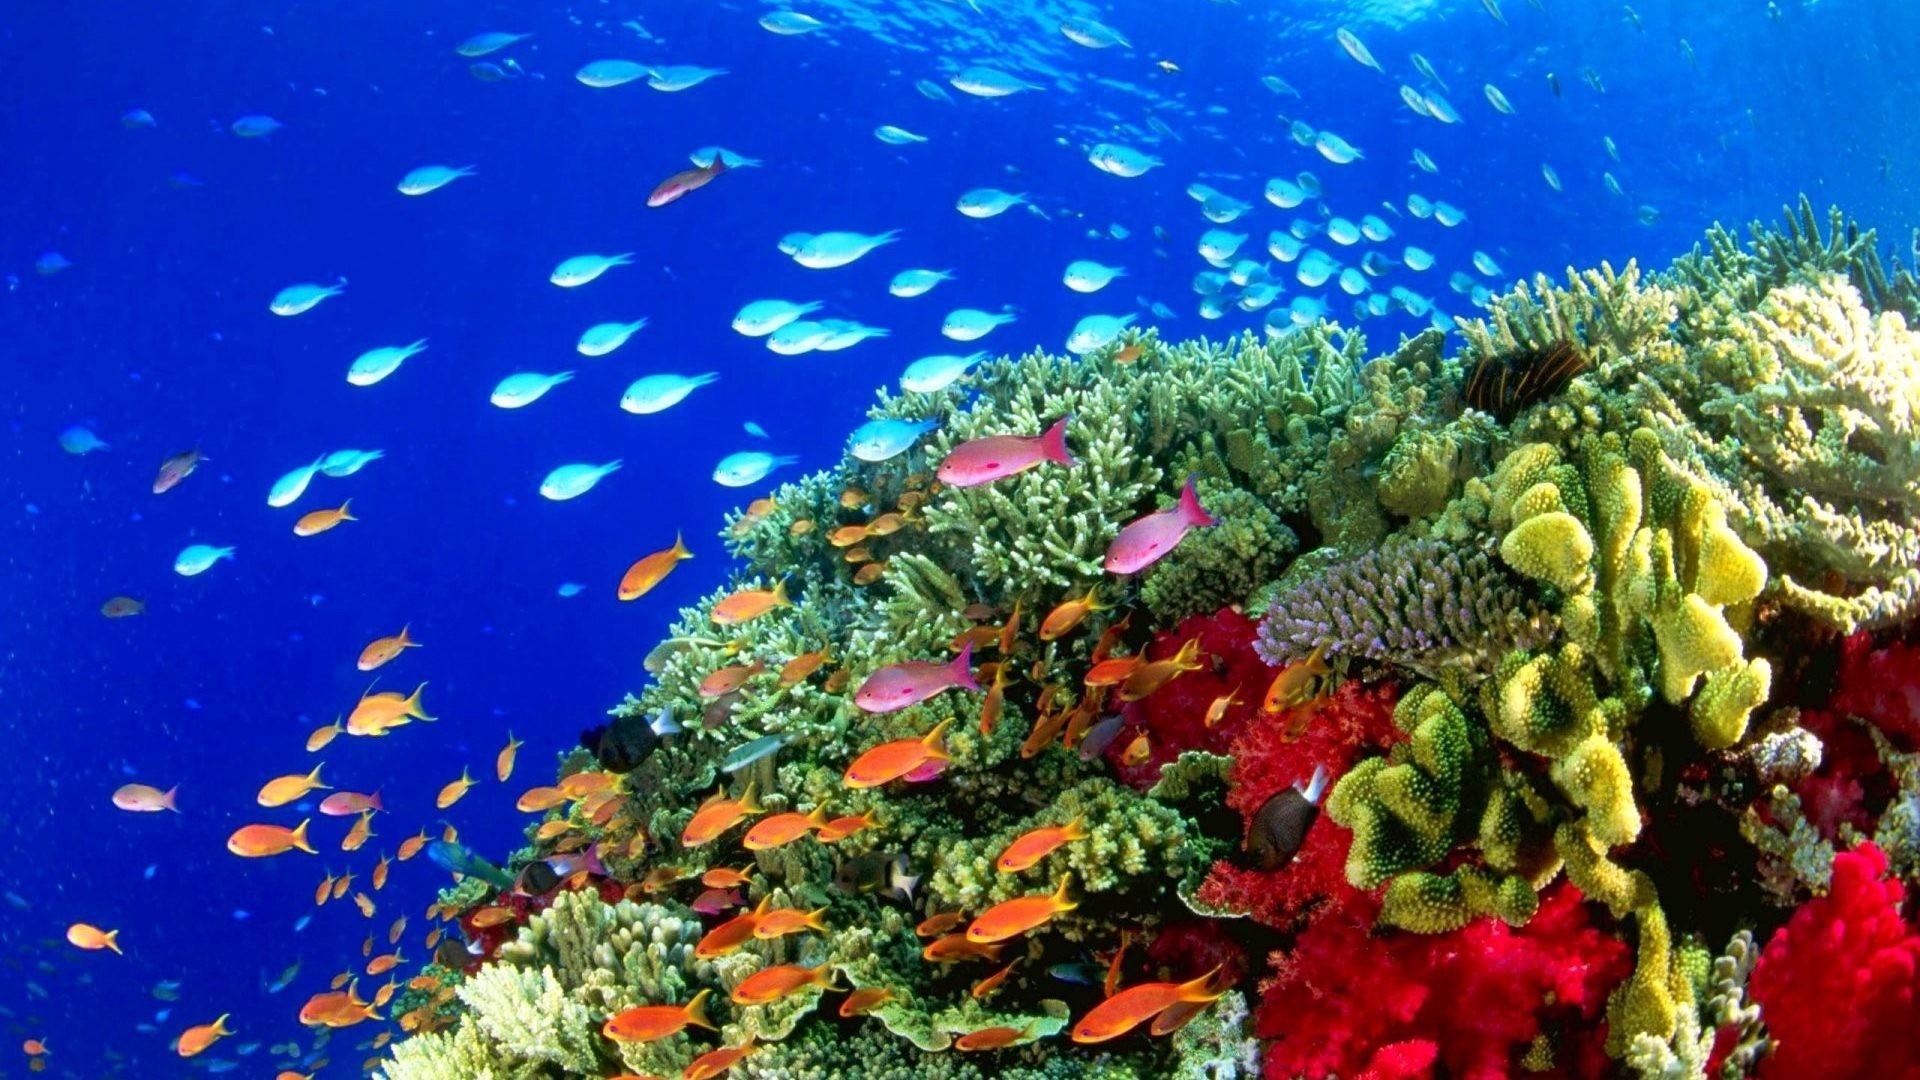 Fish Tag – Sealife Fish Ocean Underwater Fishes Sea Nature Pictures  Aquarium Stock Photography for HD